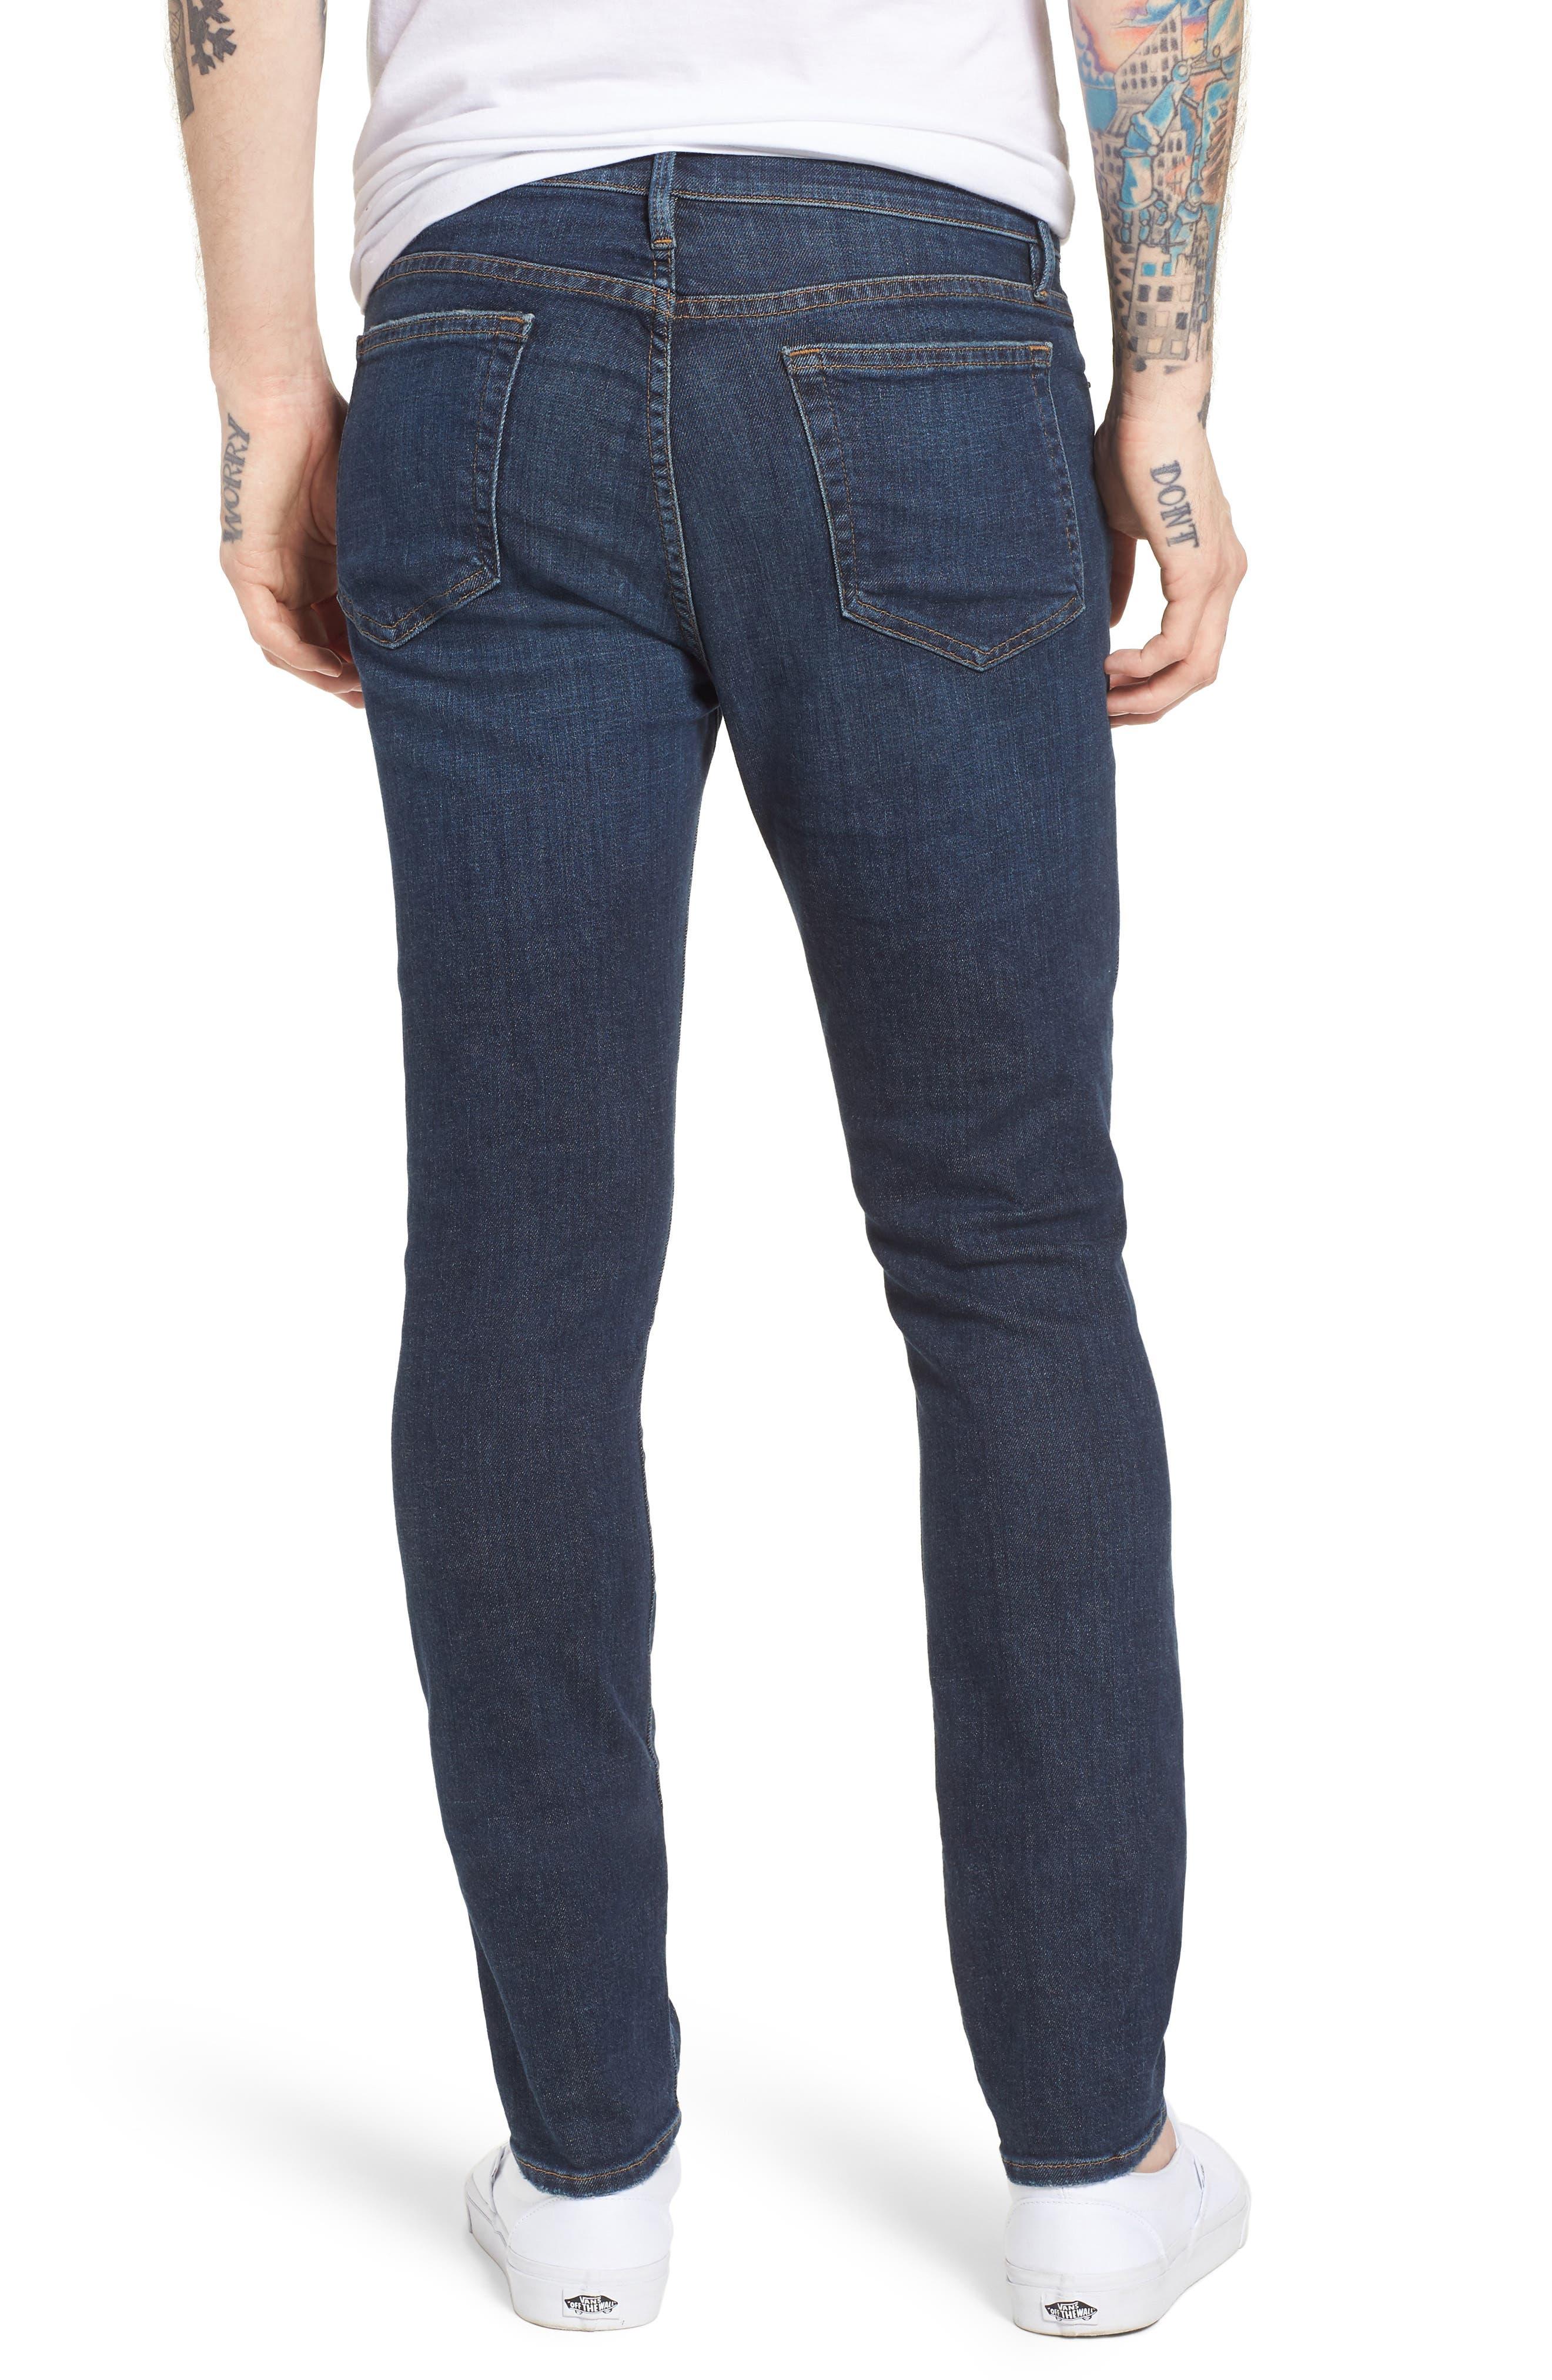 L'Homme Skinny Jeans,                             Alternate thumbnail 2, color,                             Loris